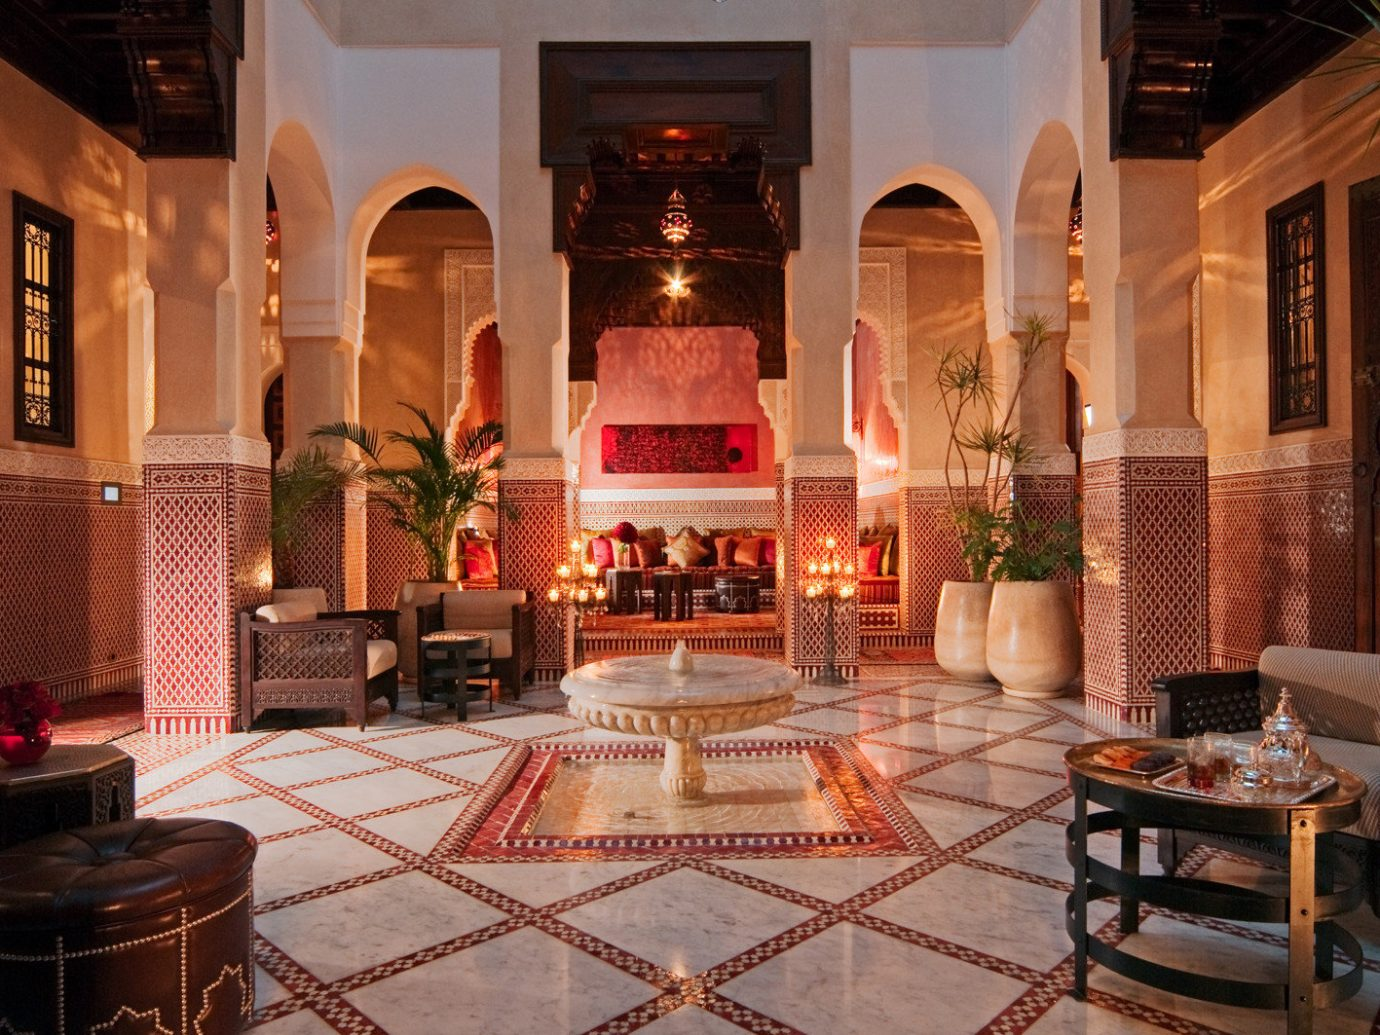 Hotels Lobby indoor estate interior design lighting palace mansion living room hacienda restaurant